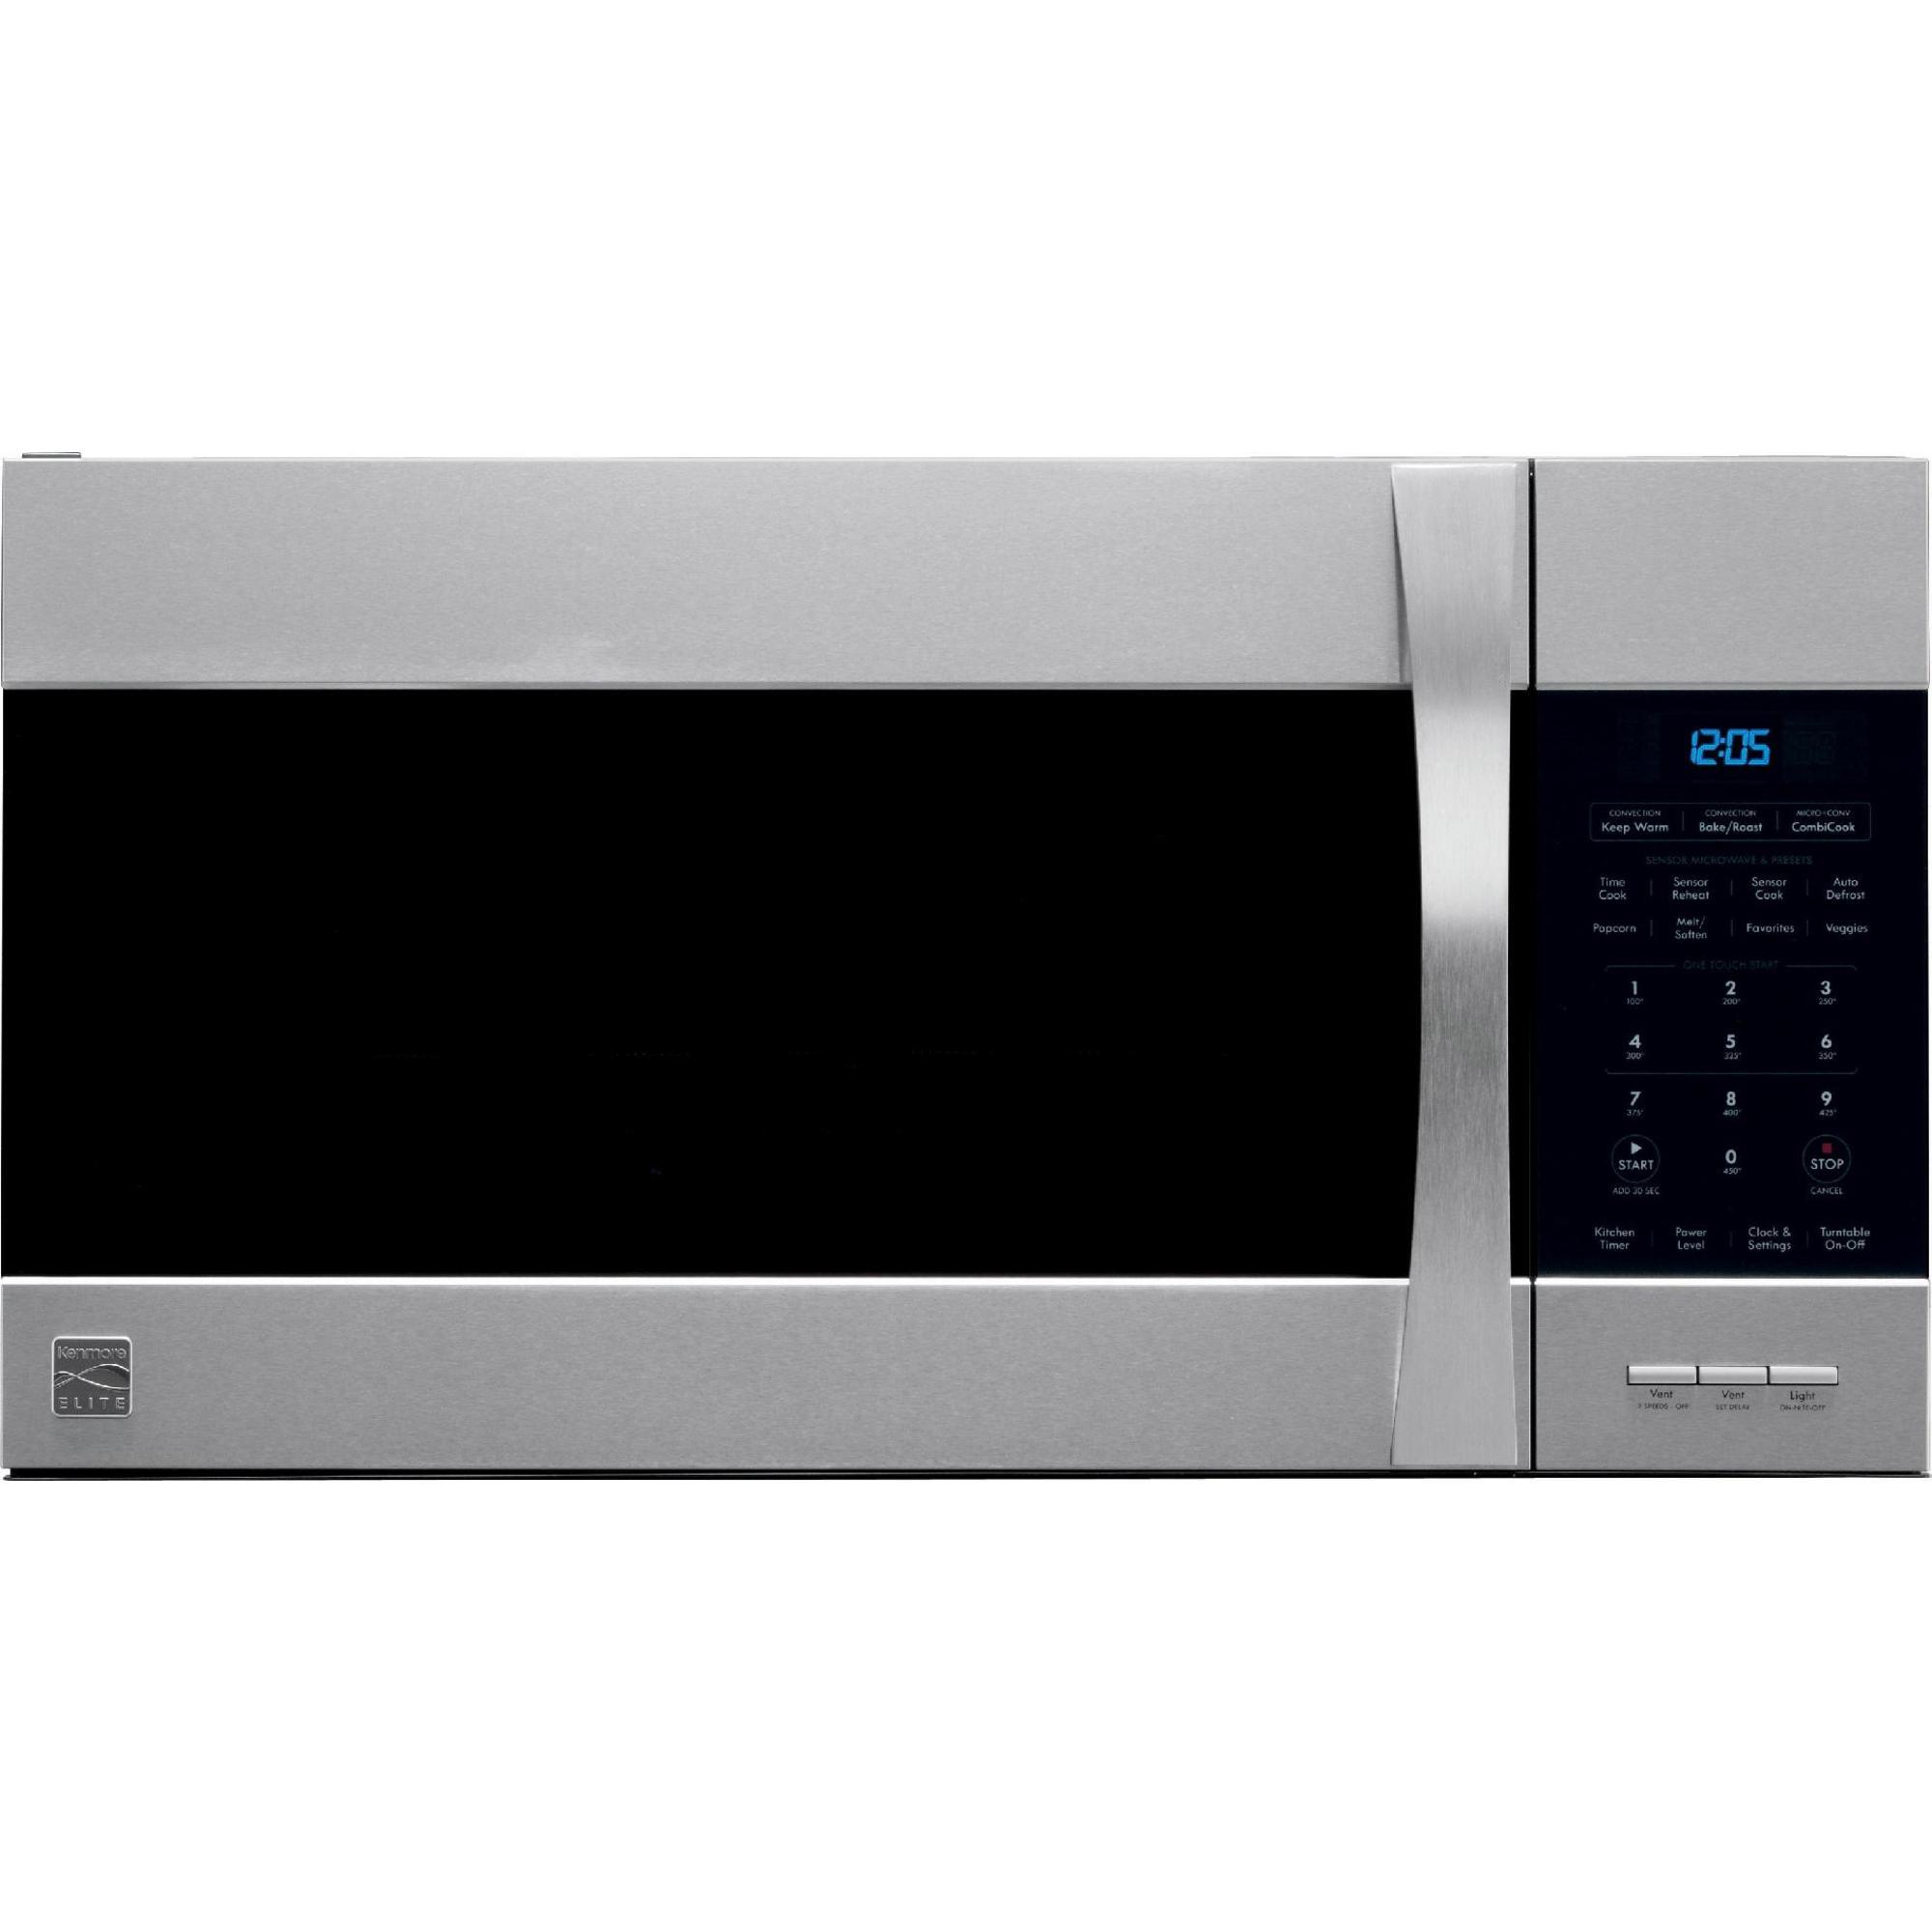 KenmoreElite model 79080363310 microwavehood bo